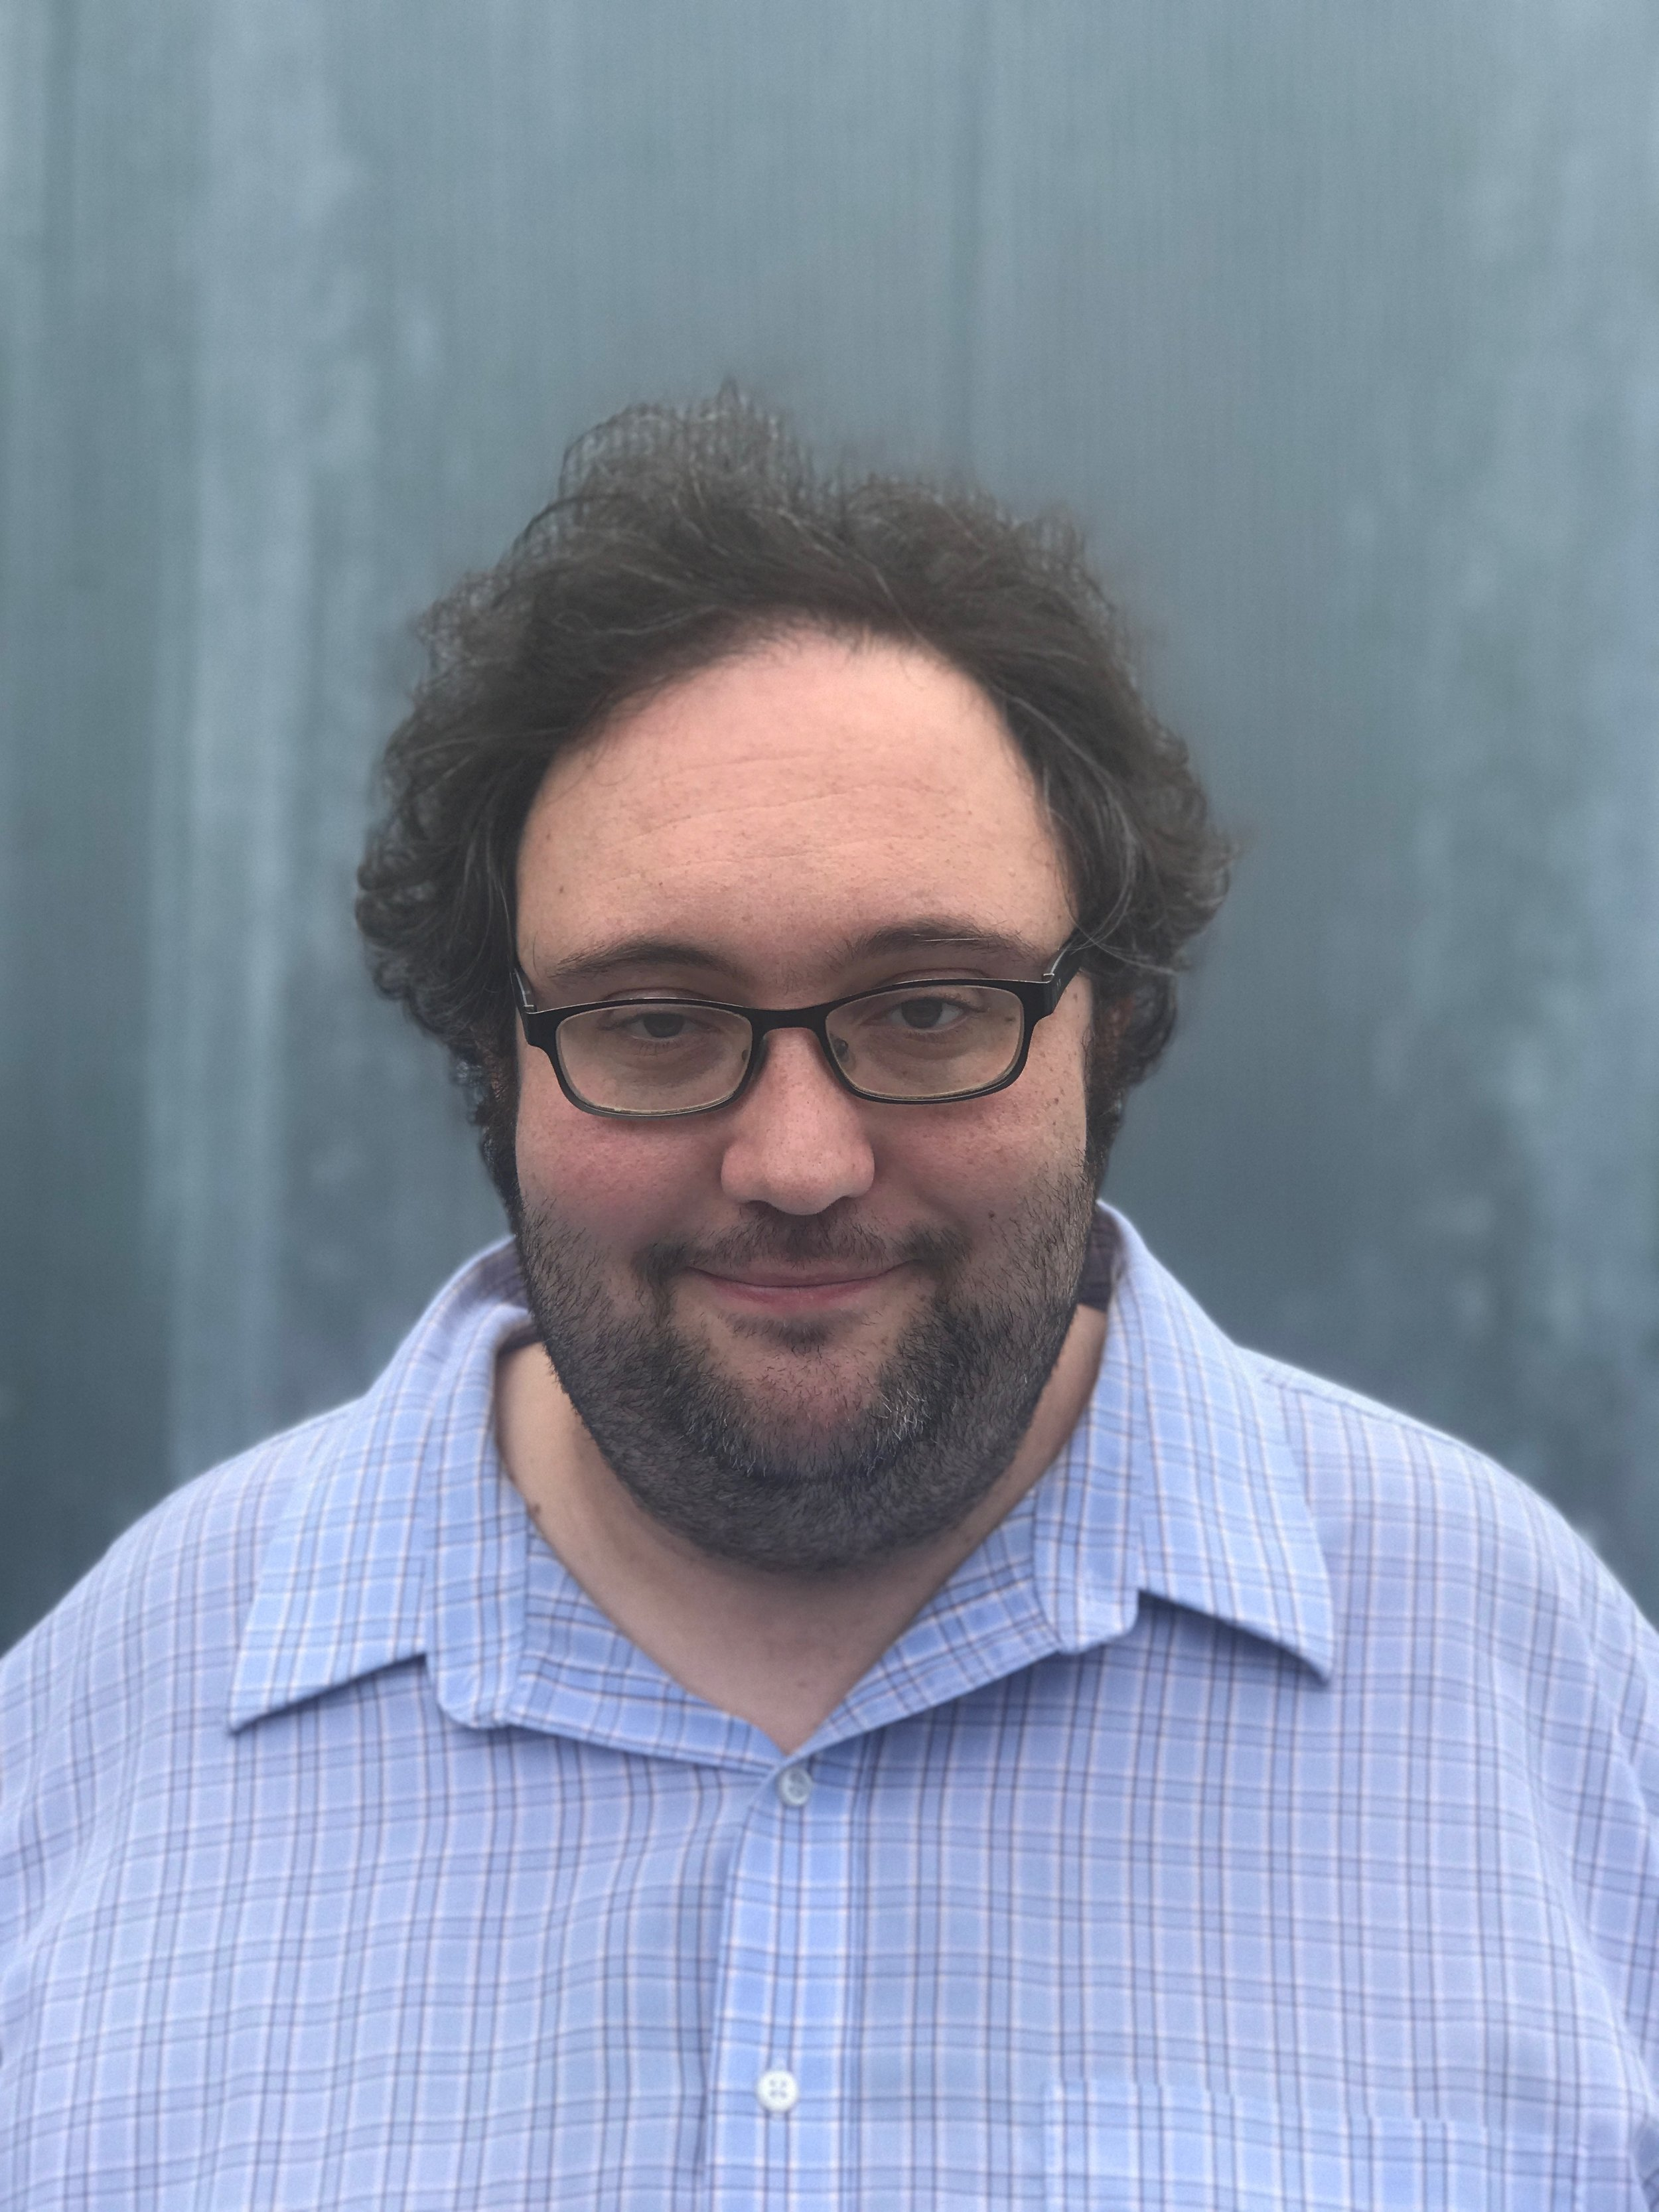 Aaron | Co-Founder